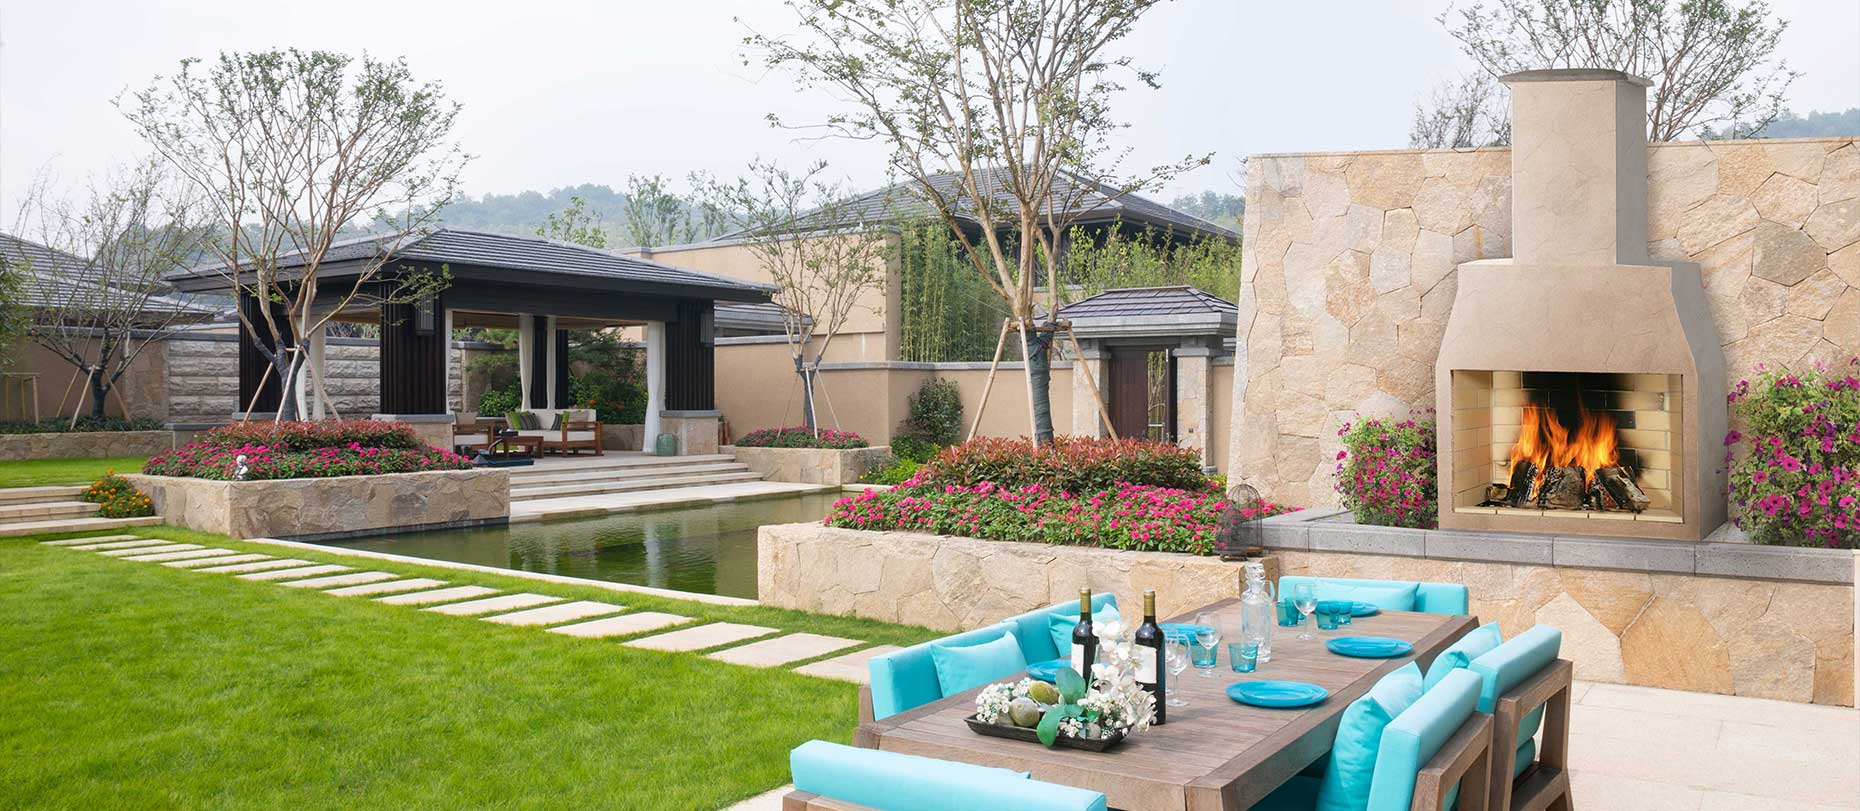 Free Garden Fireplace for the Best Garden Landscape Design ...